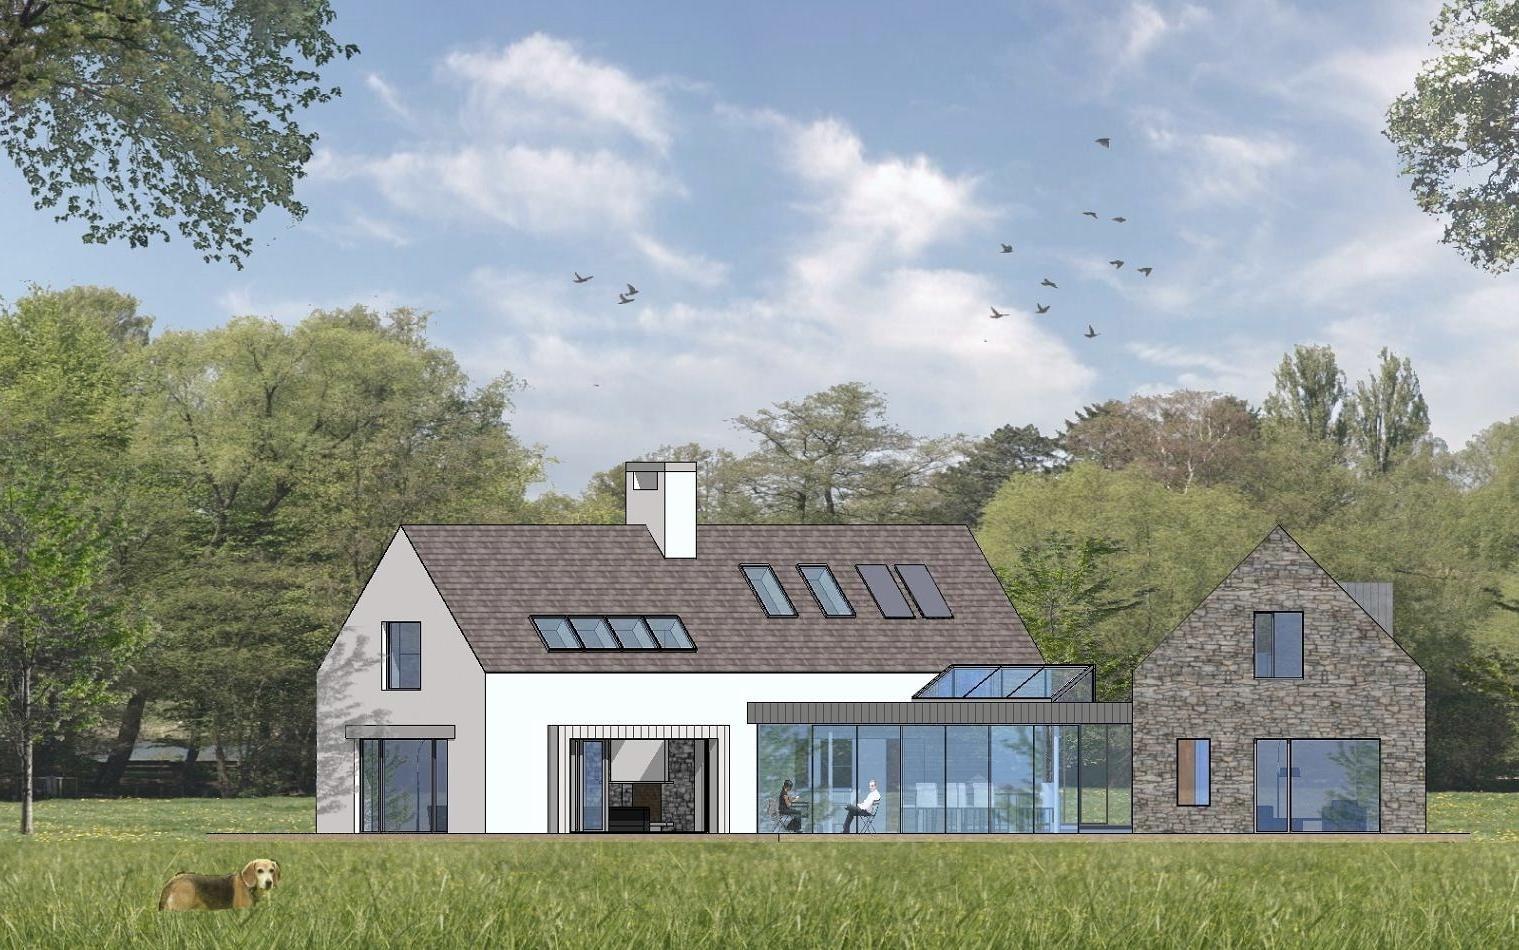 Irish cottage house plans - Contemporary 4 Bedroom Irish Countryside Dwelling